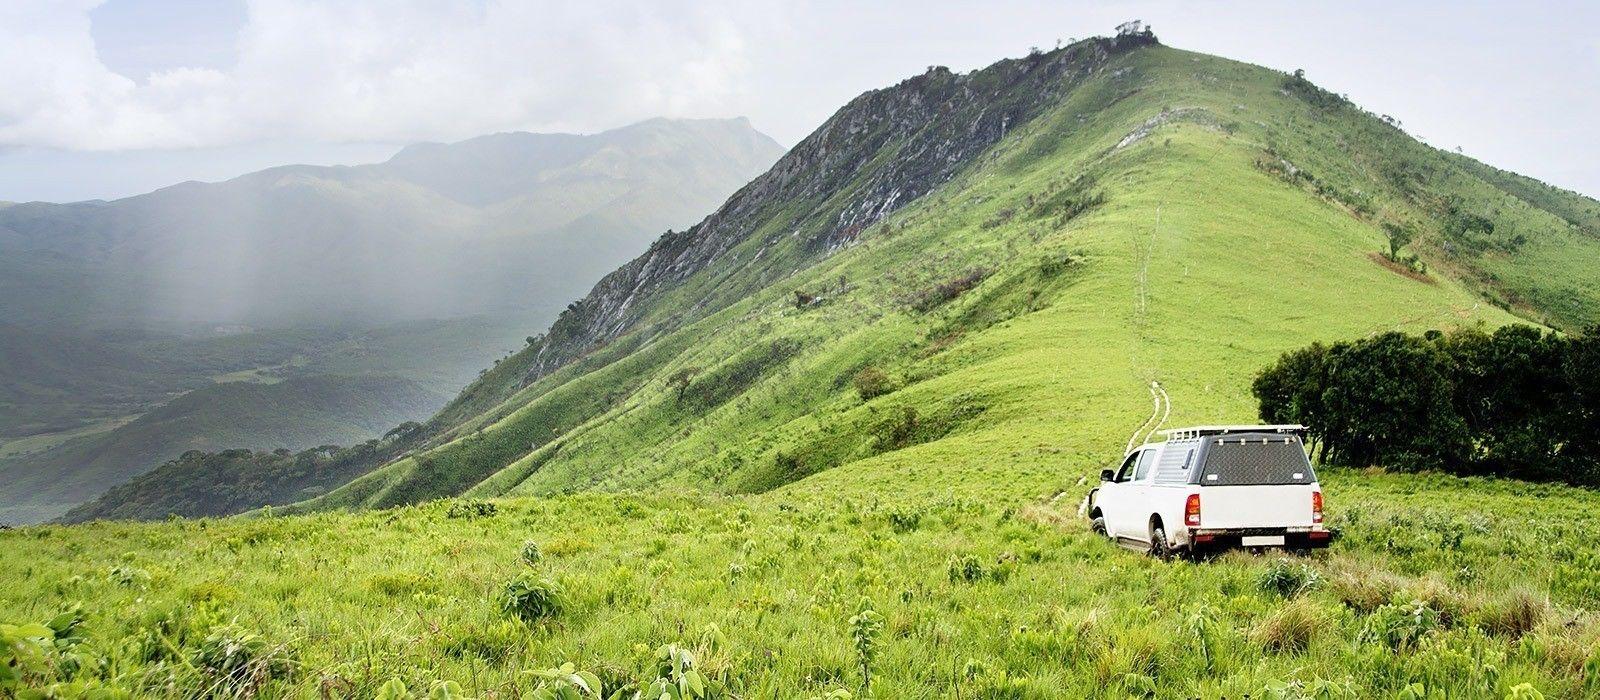 Destination Shire Highlands Malawi